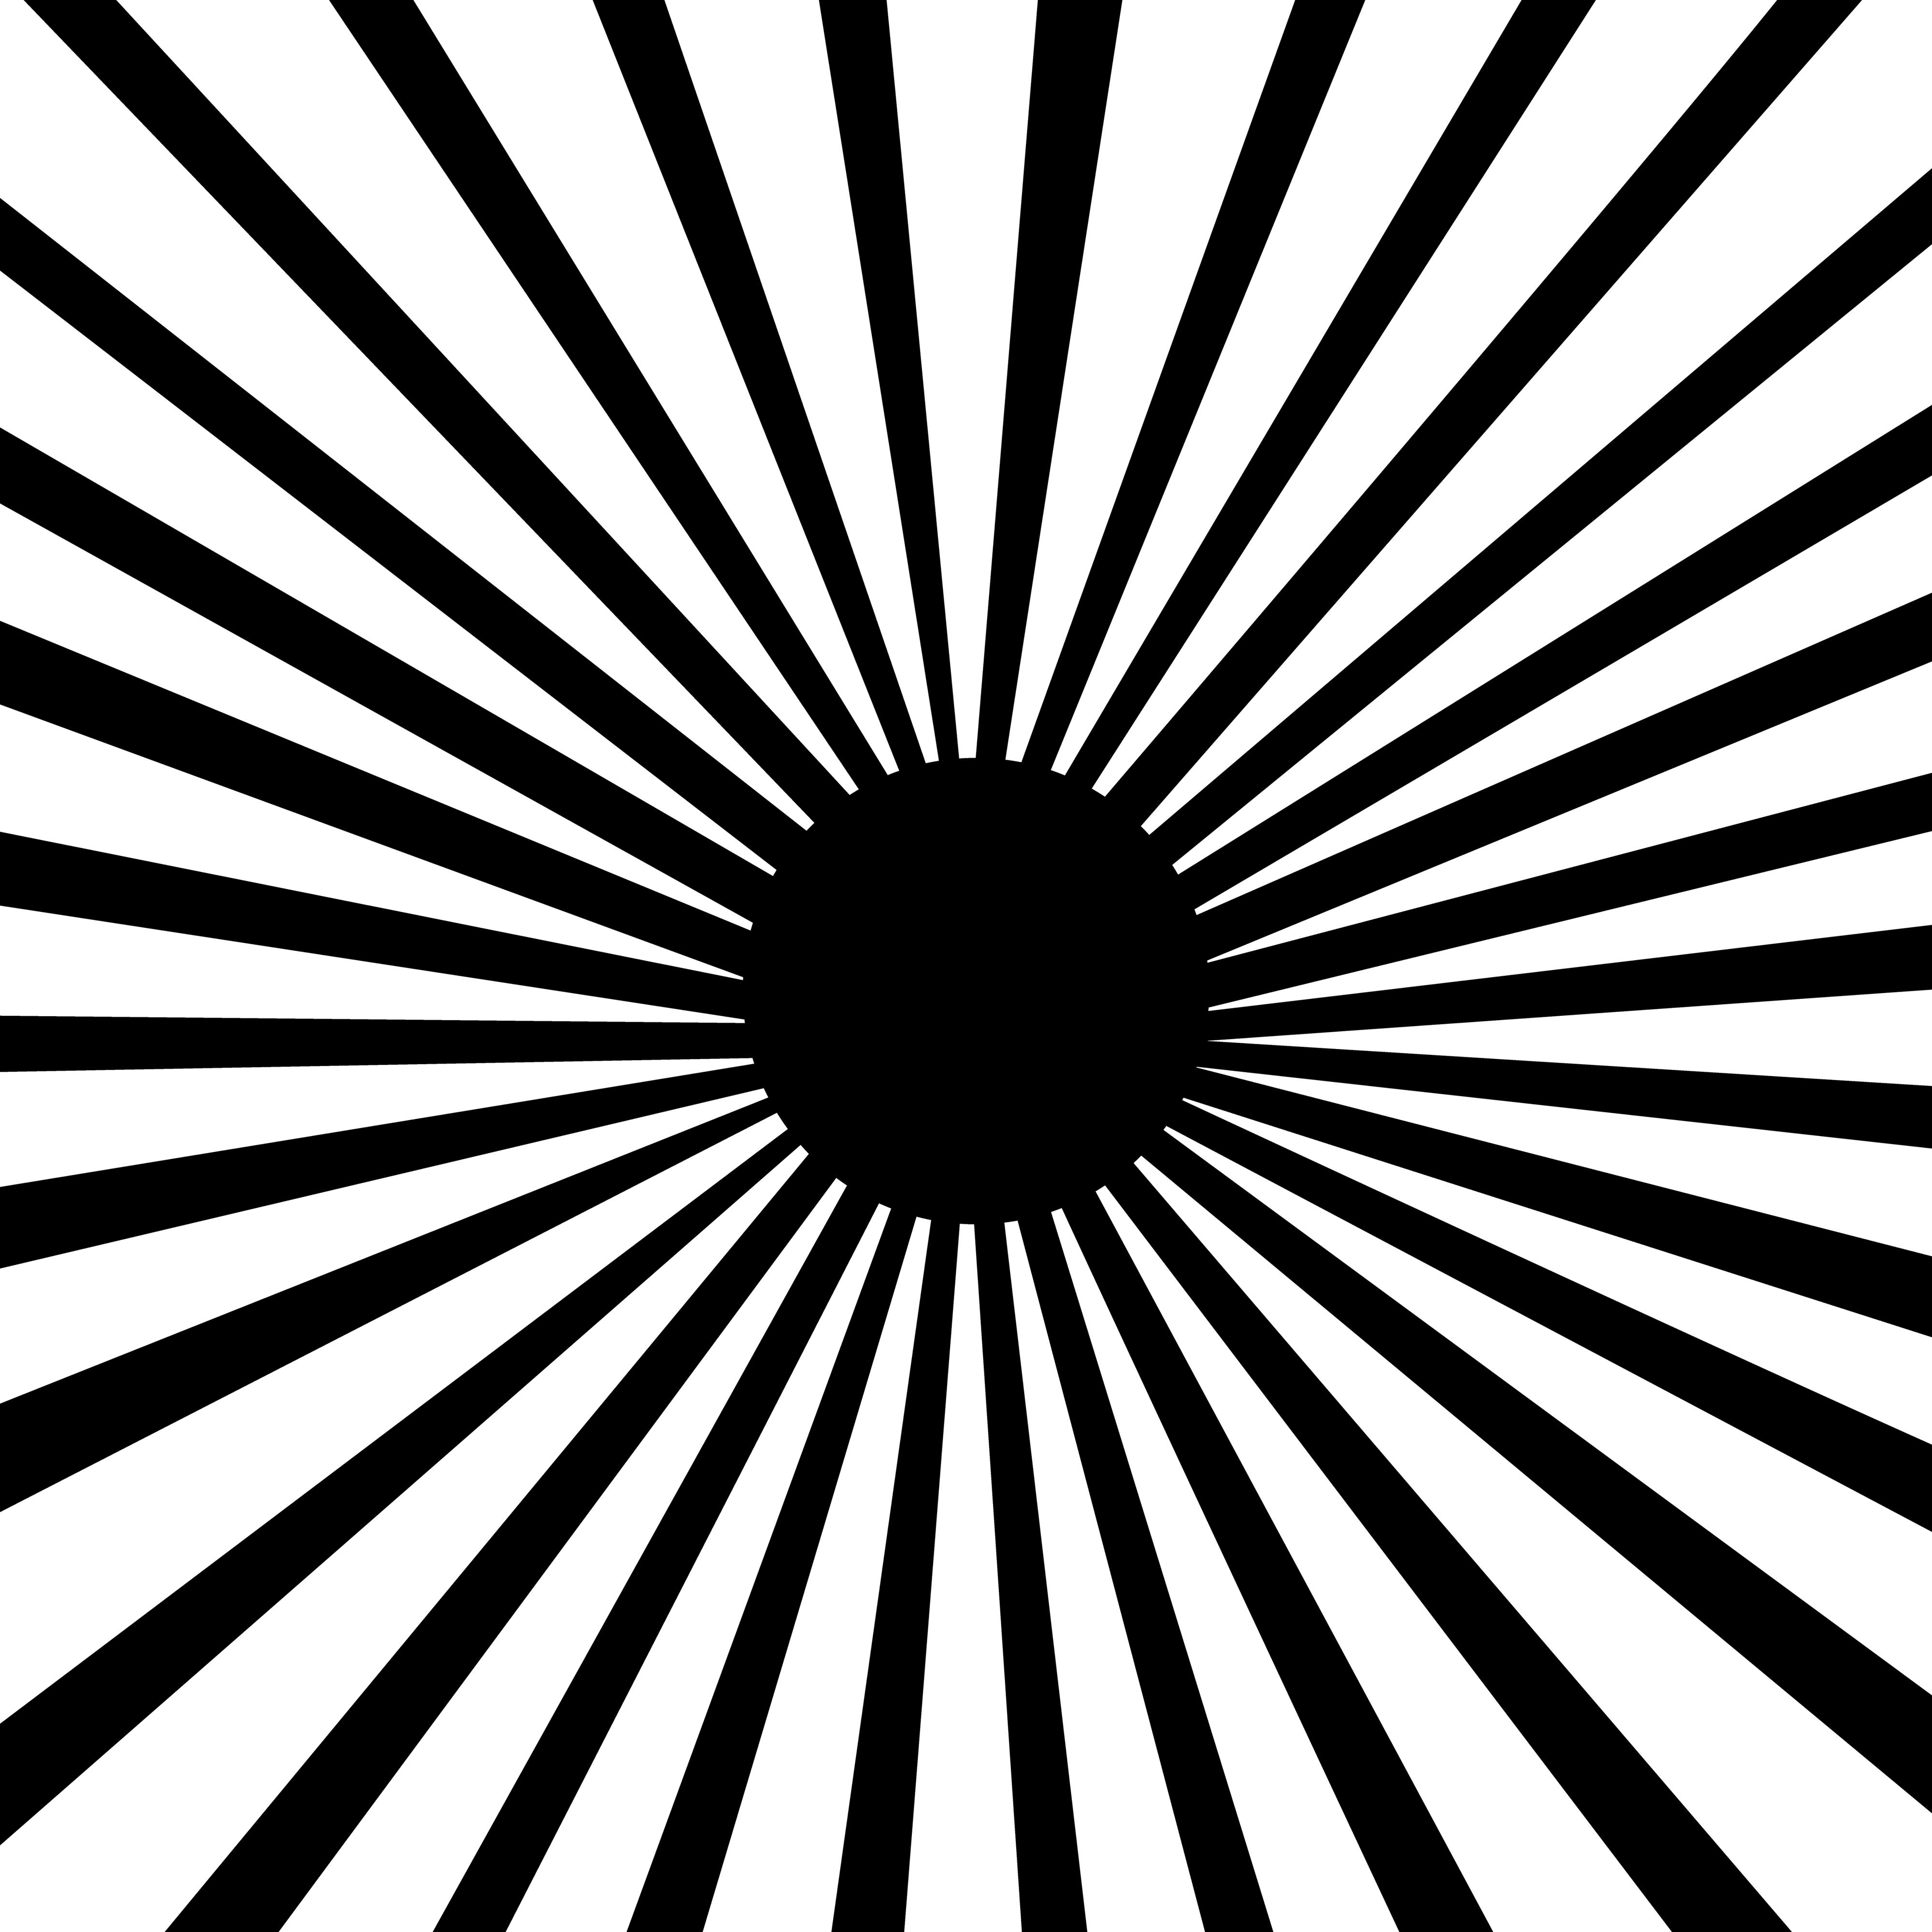 Lineart Burst Pattern Inverse Black White Clip Art.